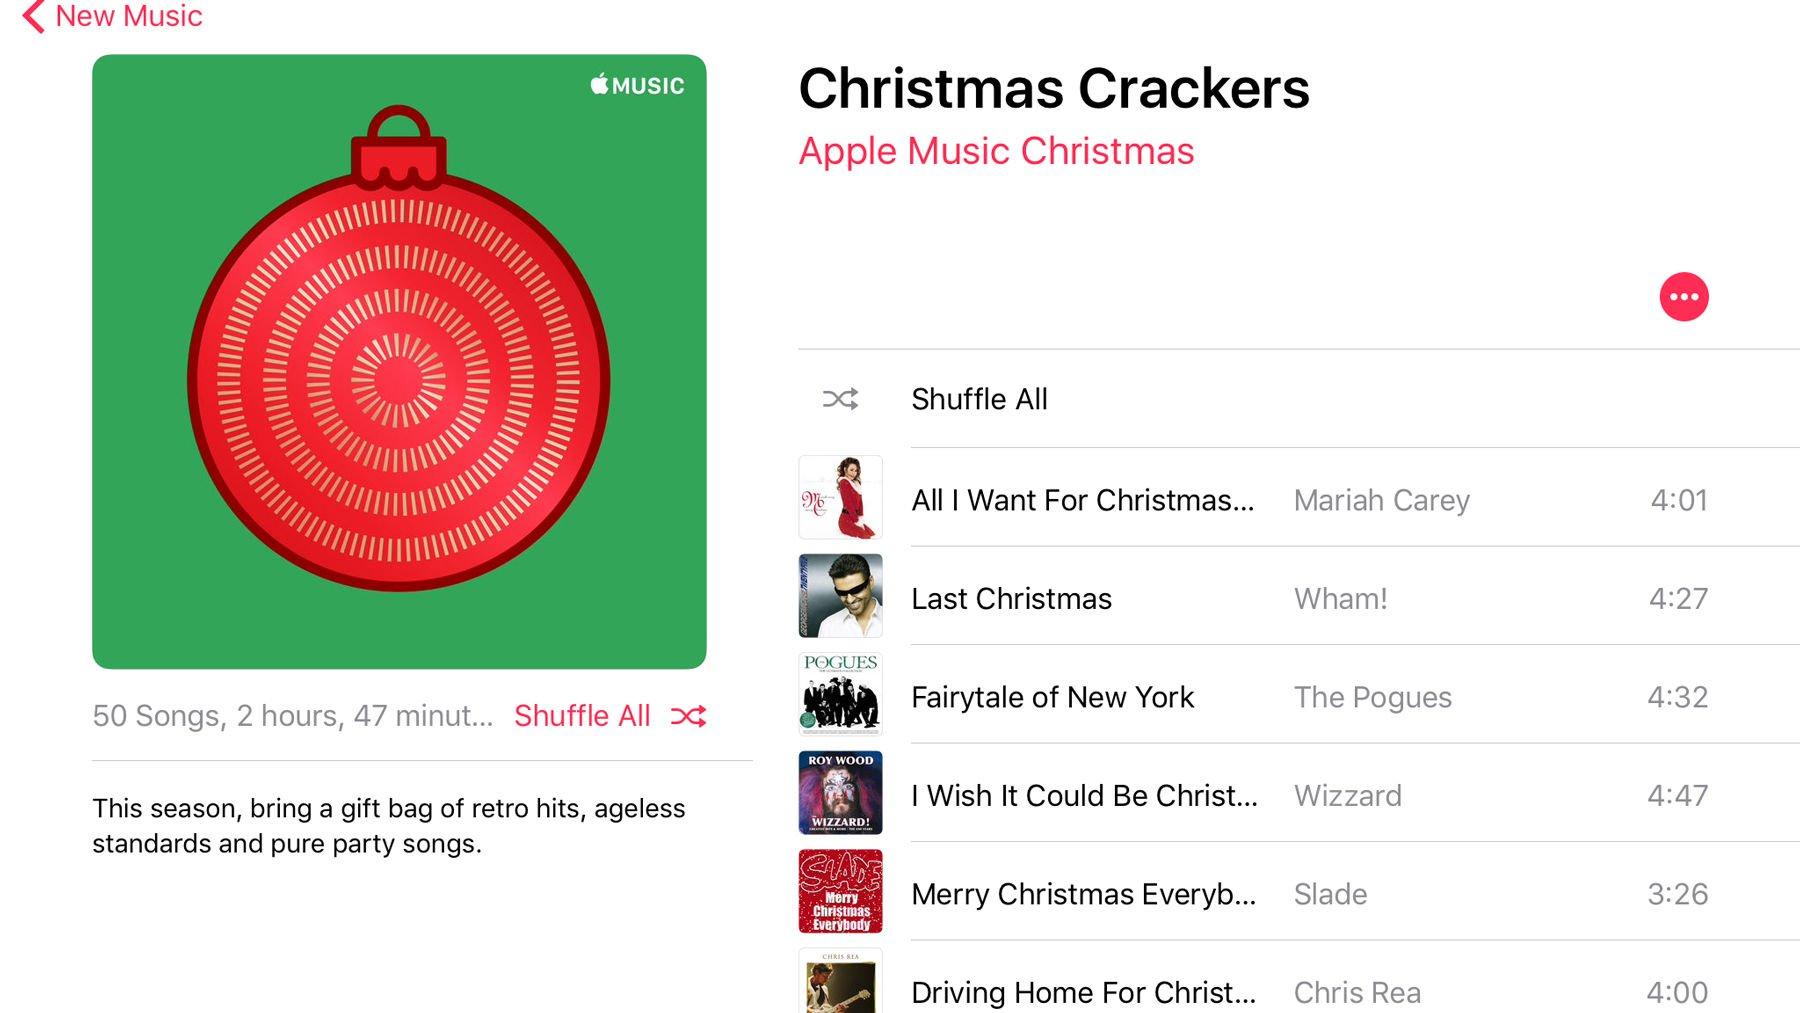 Best Christmas music on Apple Music: Christmas Crackers